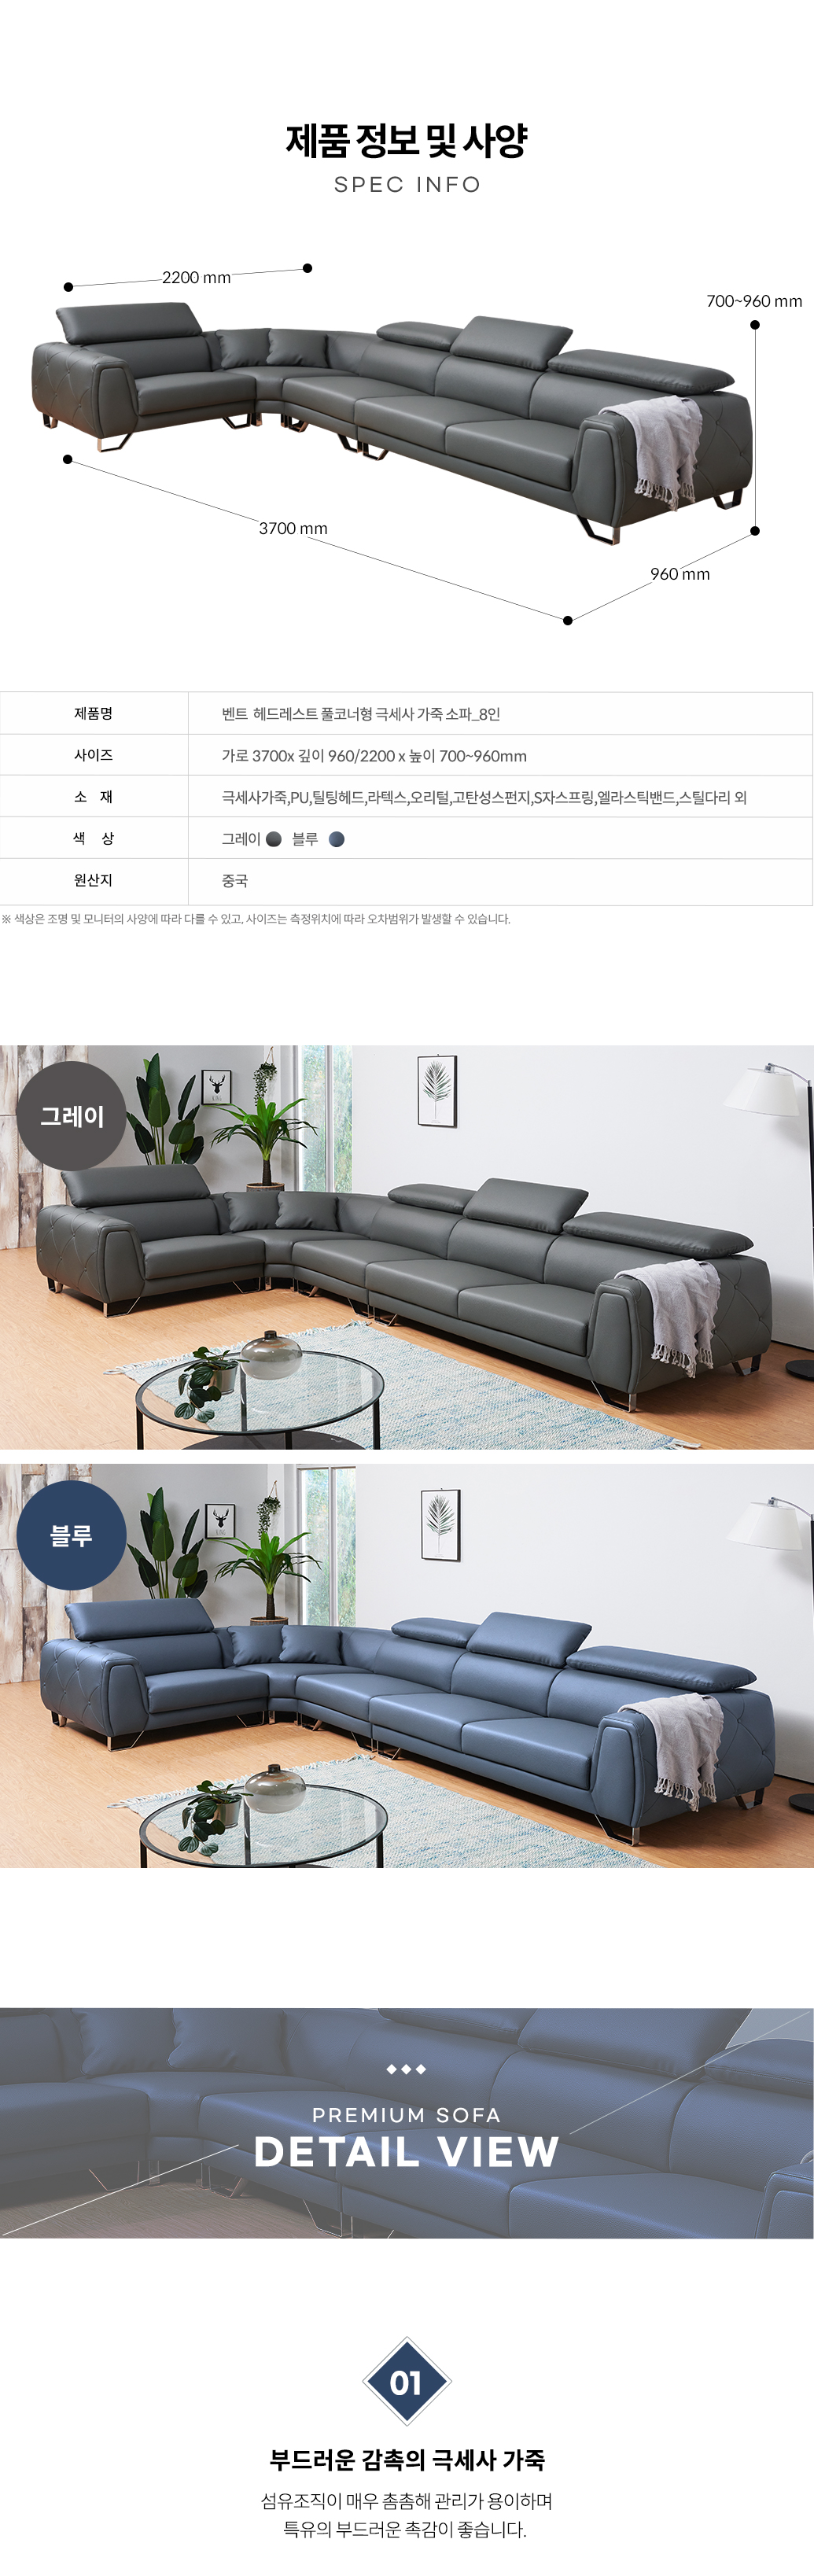 bent8_sofa_02.jpg